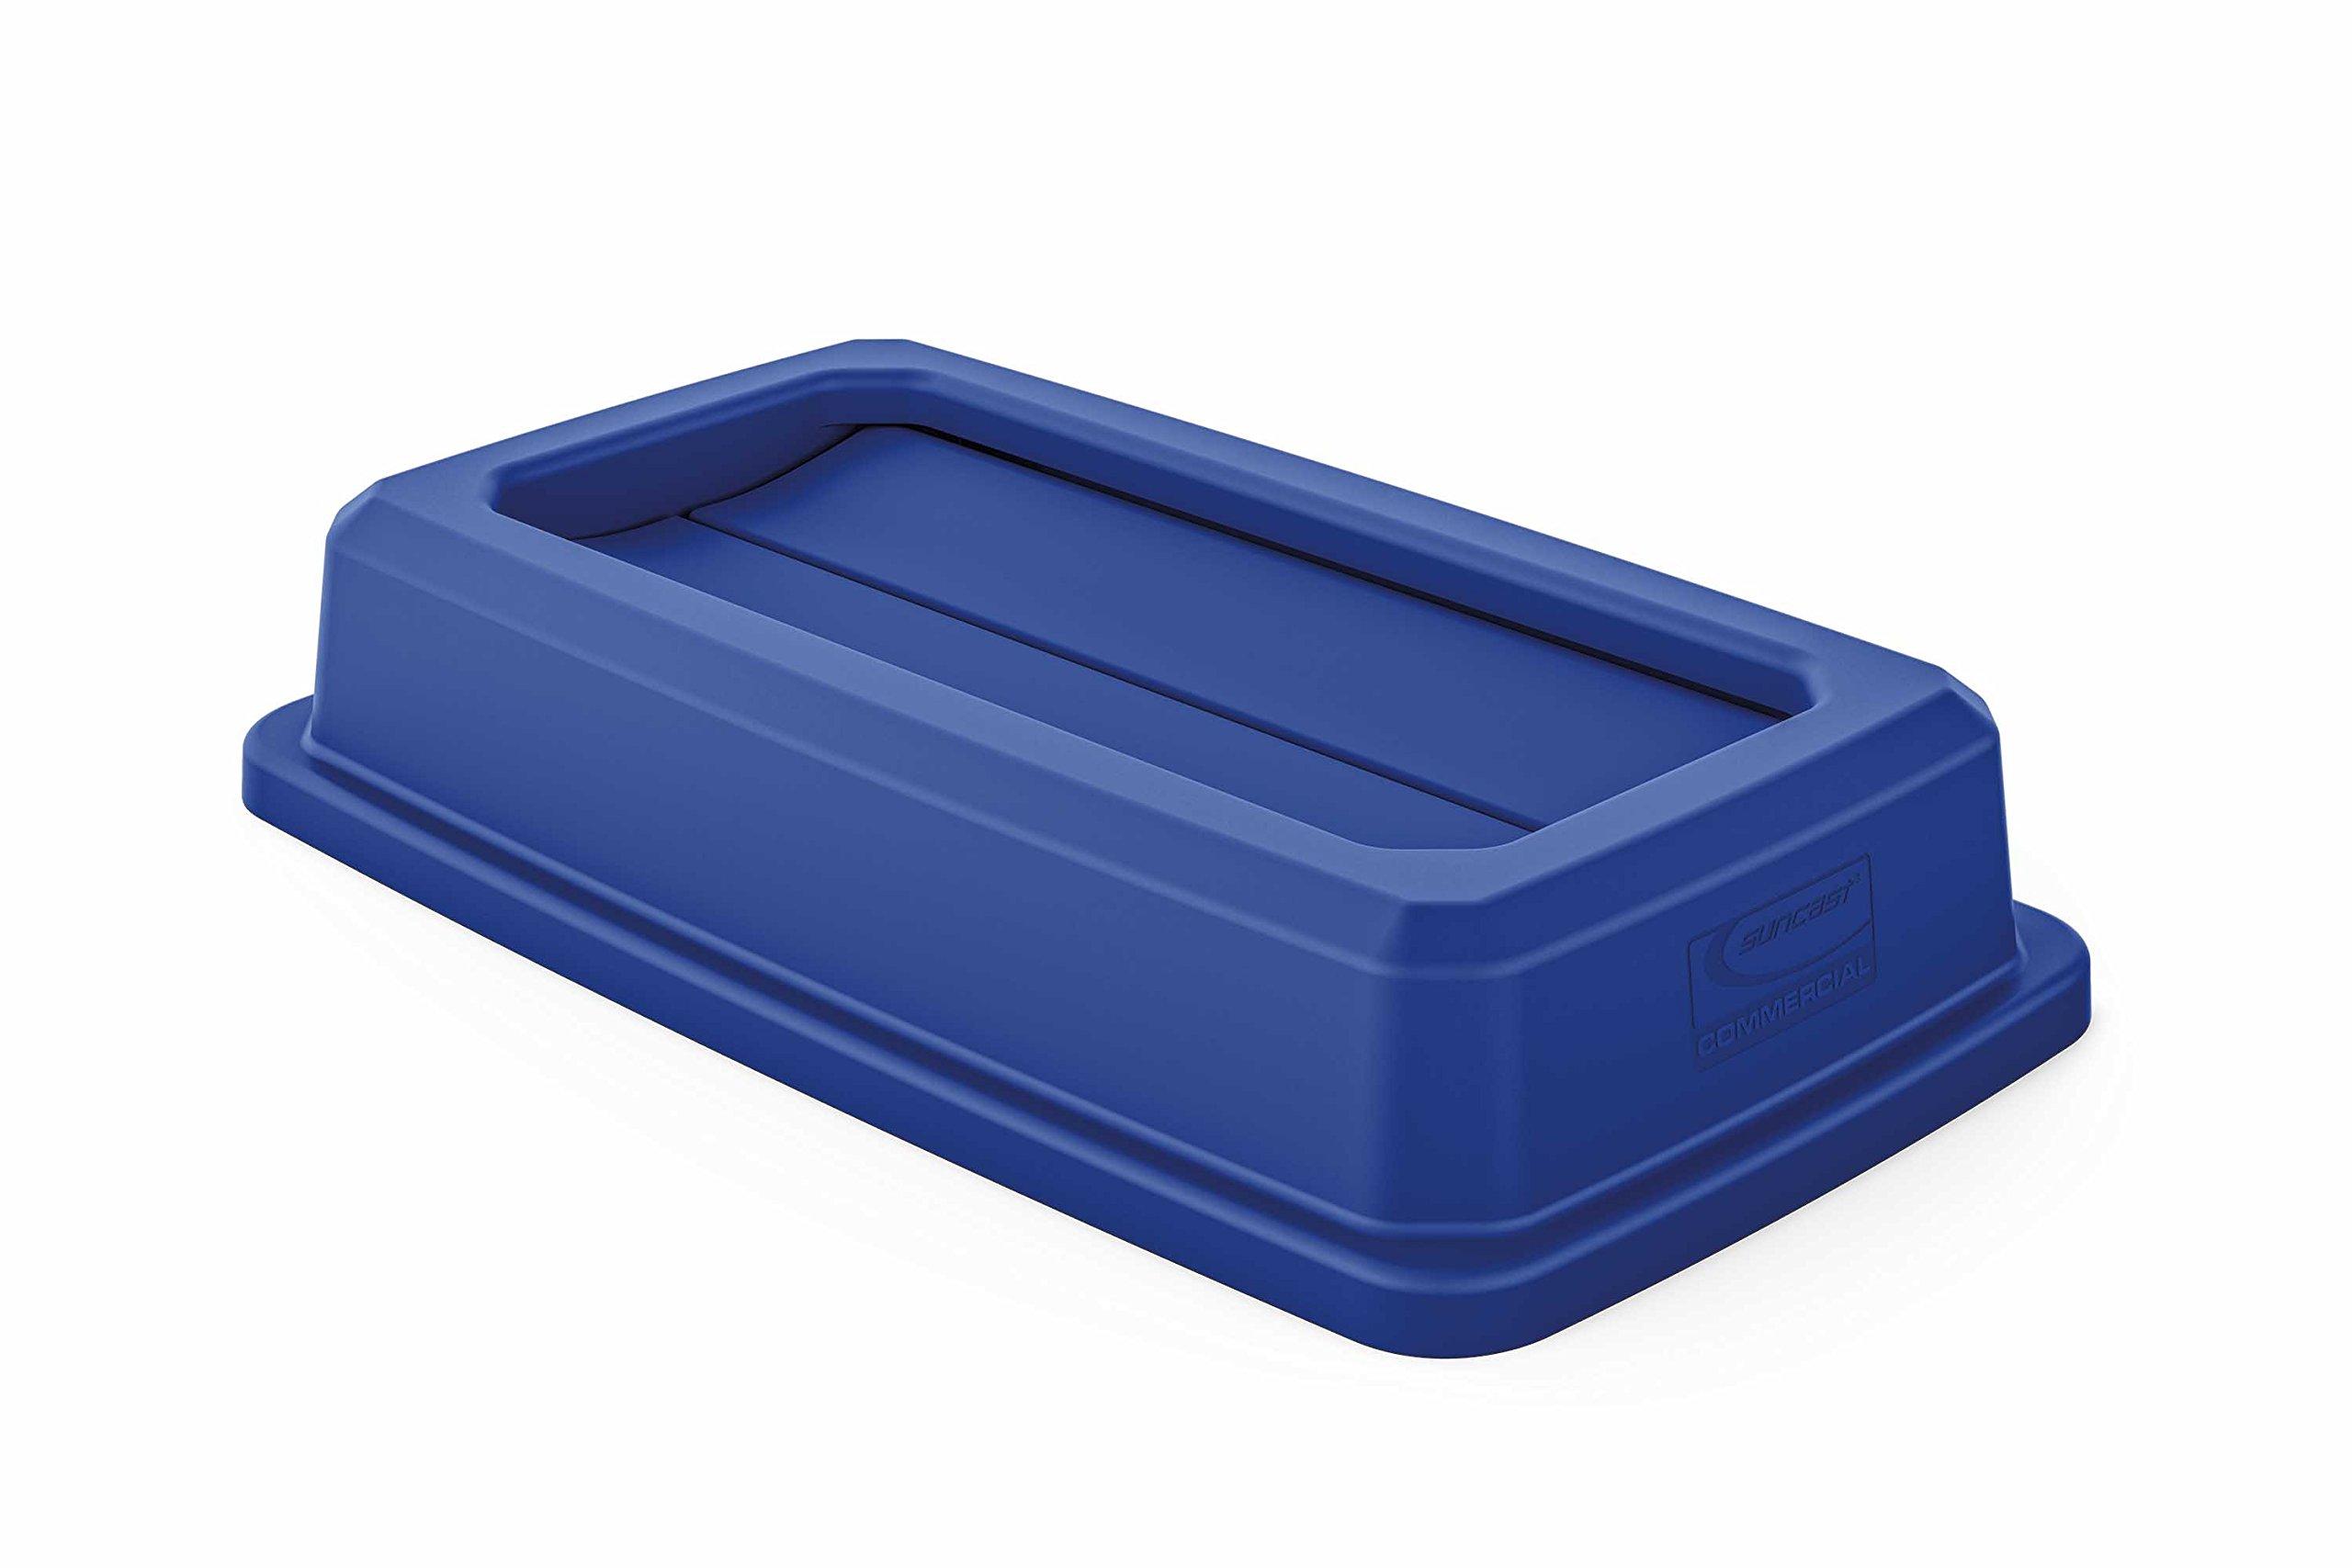 Suncast Commercial TCNLID01BL Slim Trash Can, Double Flip Lid, Blue